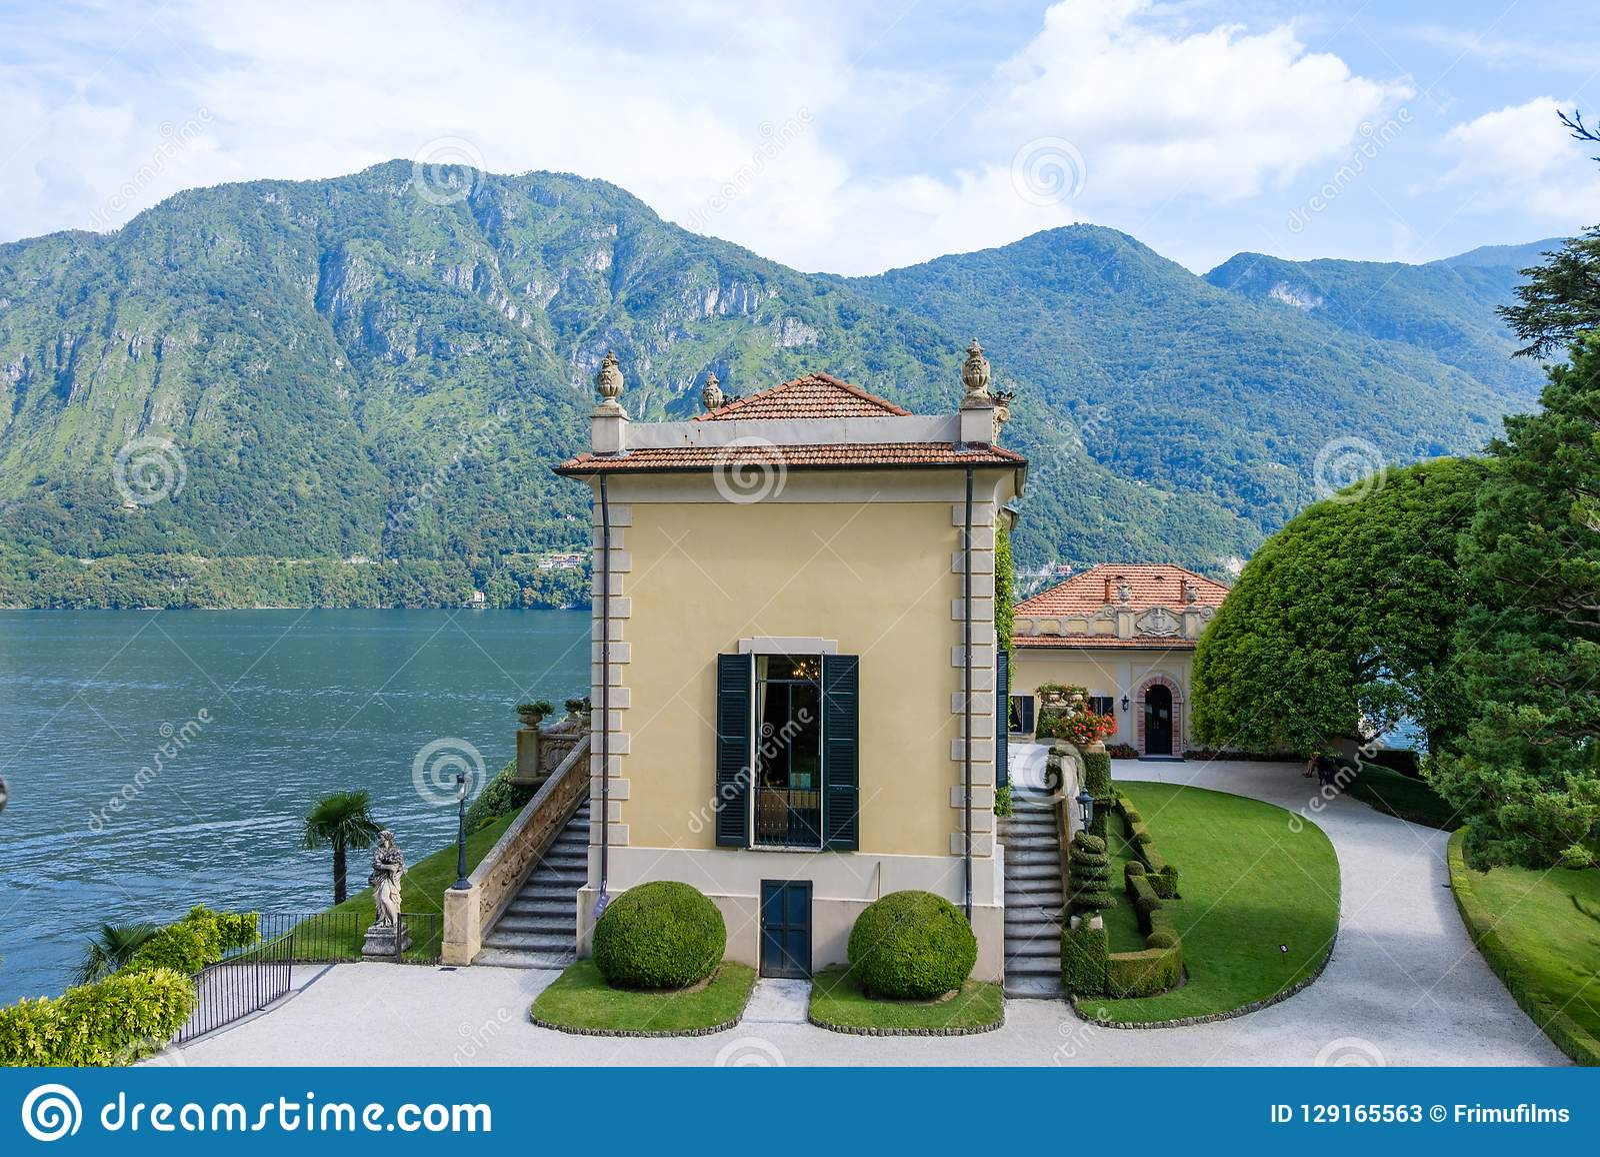 A part of Villa Balbianello with mountains